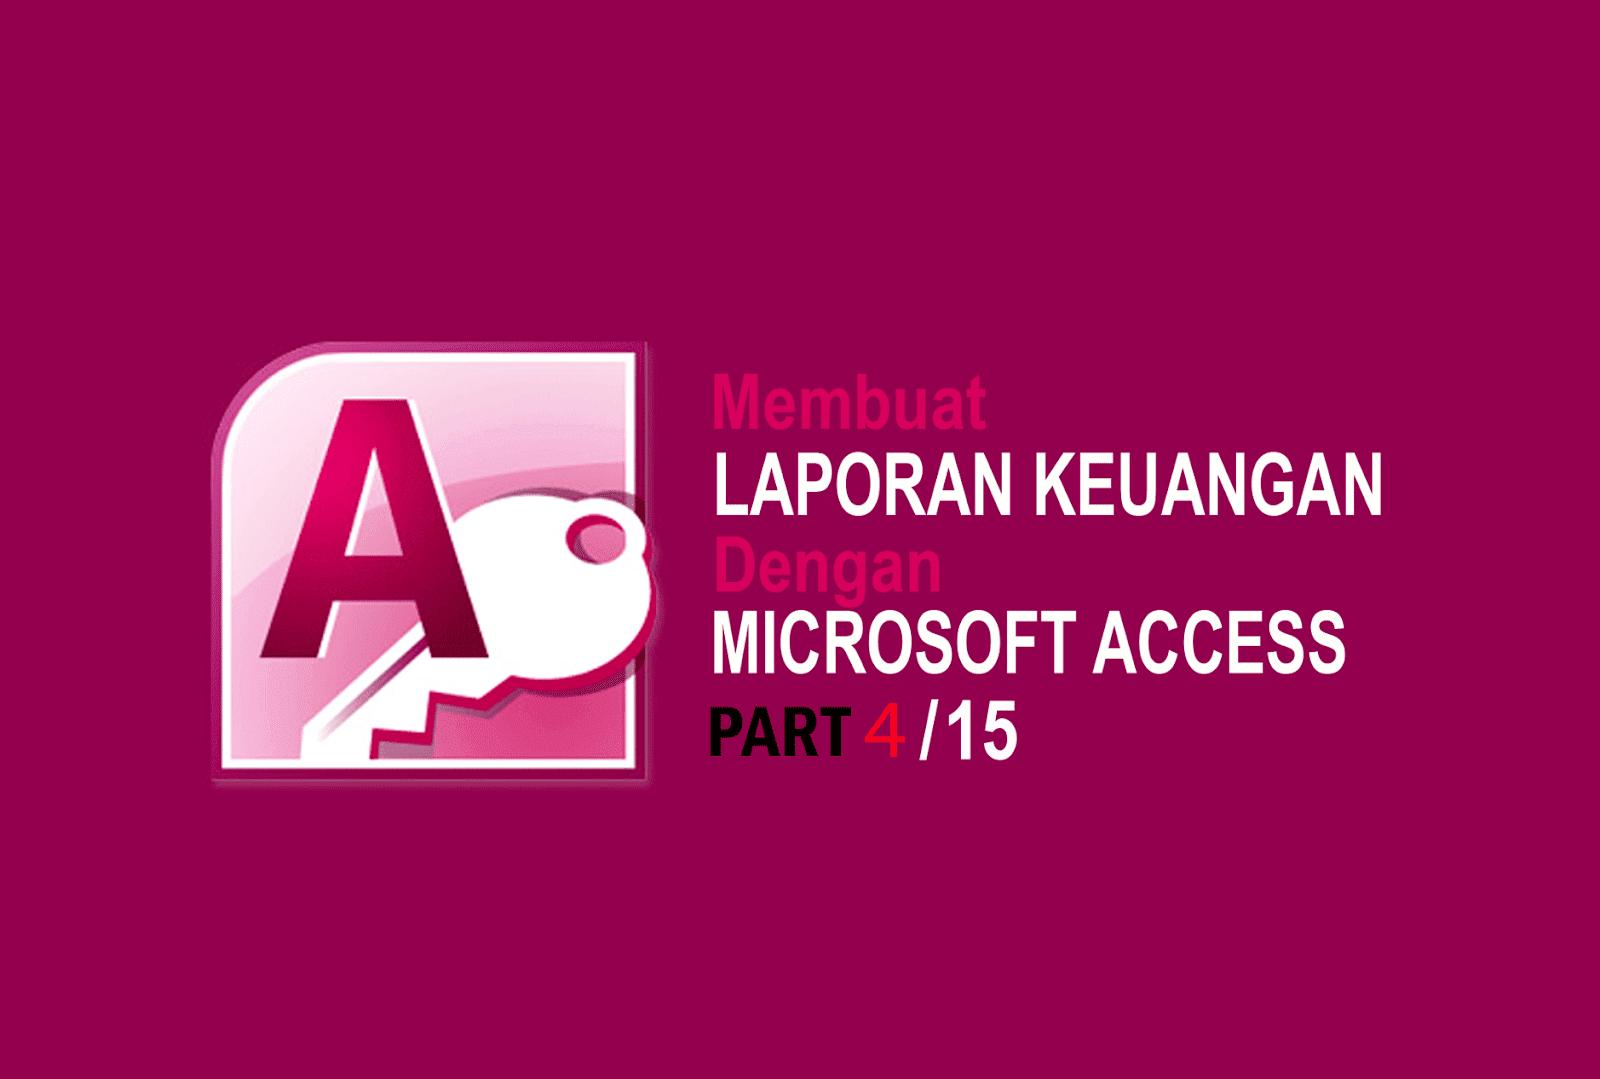 Membuat Laporan Keuangan Dengan Microsoft Access 4 15